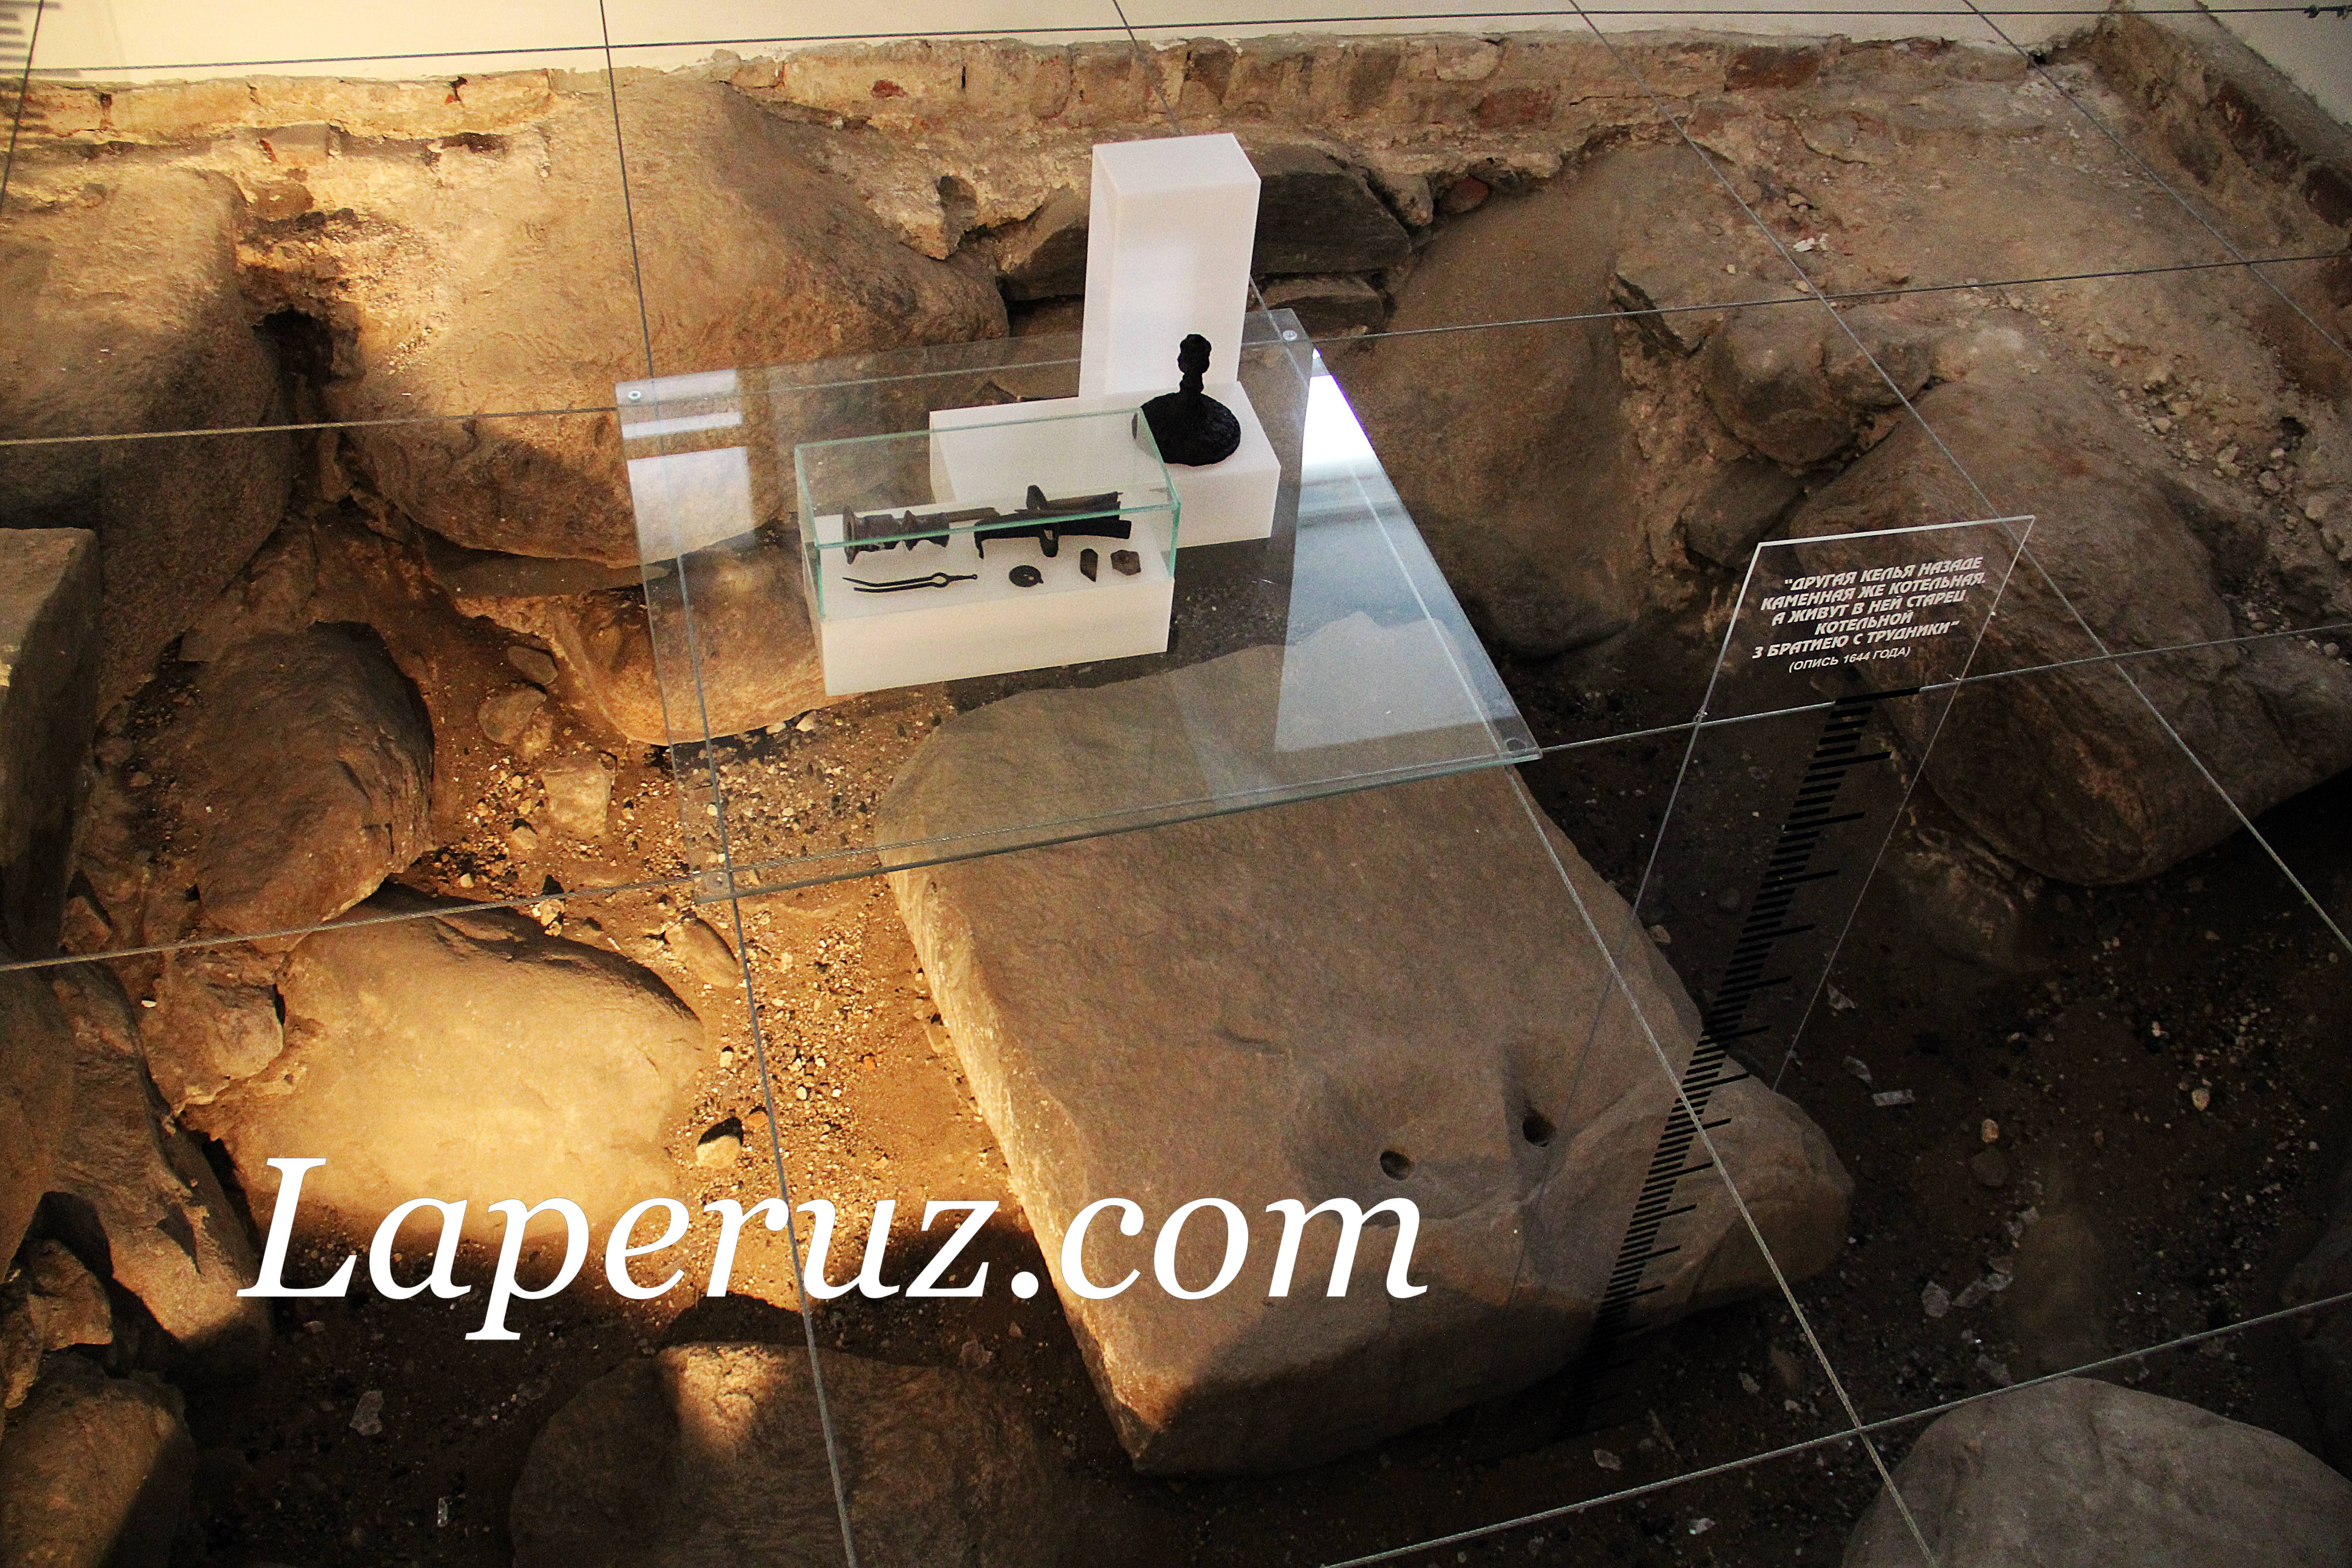 arheologicheskii_muzei_solovki_fundament_8